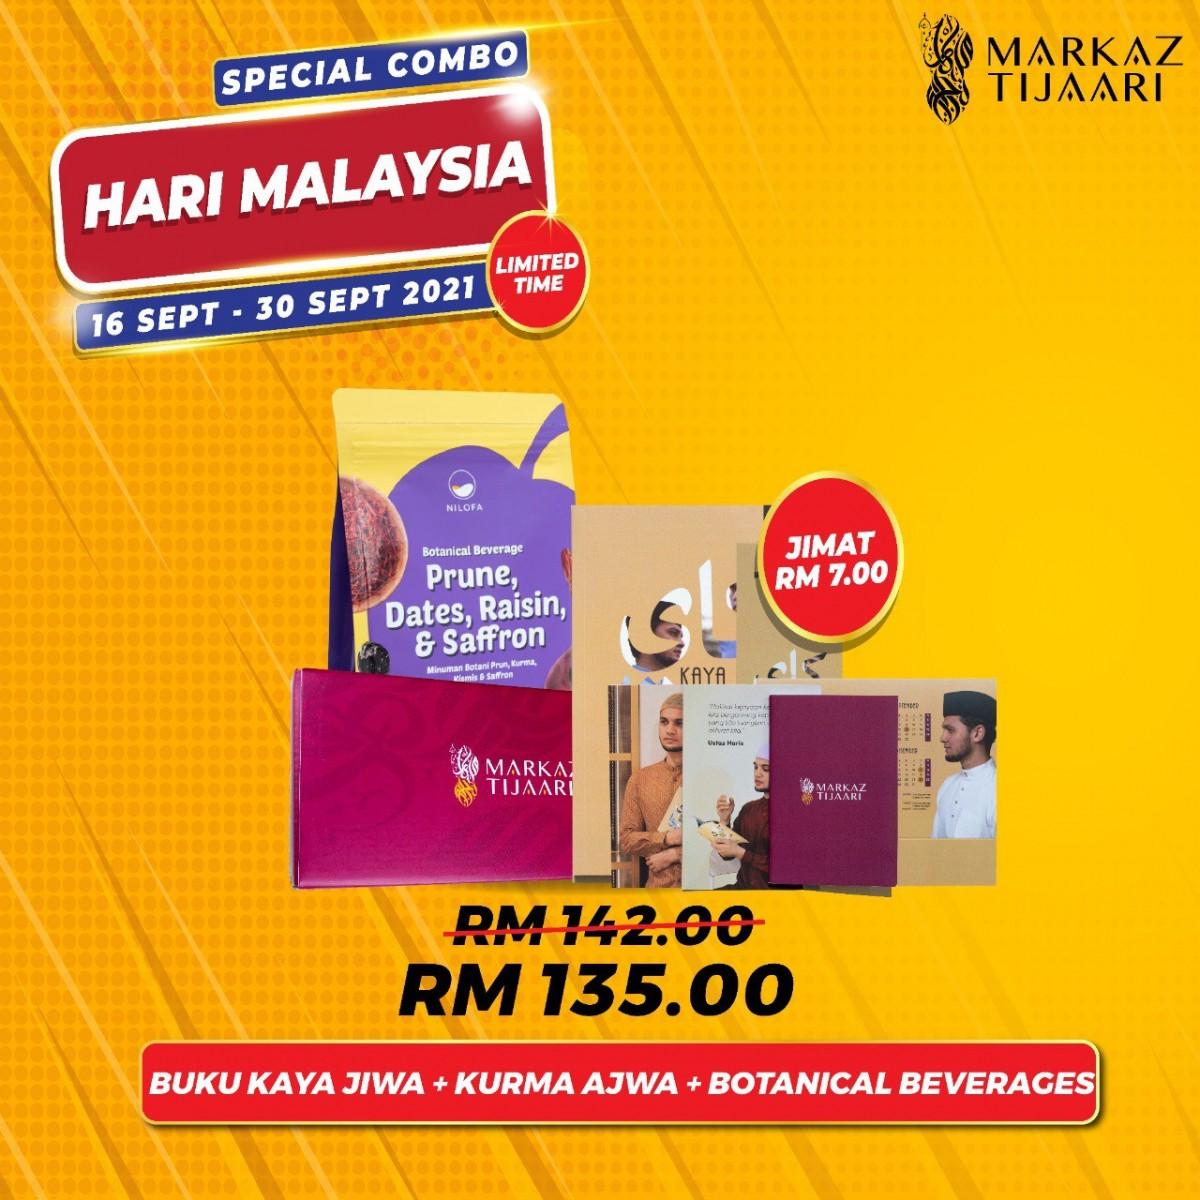 Malaysia Day Deals BKJ + Kurma Ajwa + Botanical Beverage - MARKAZ TIJAARI